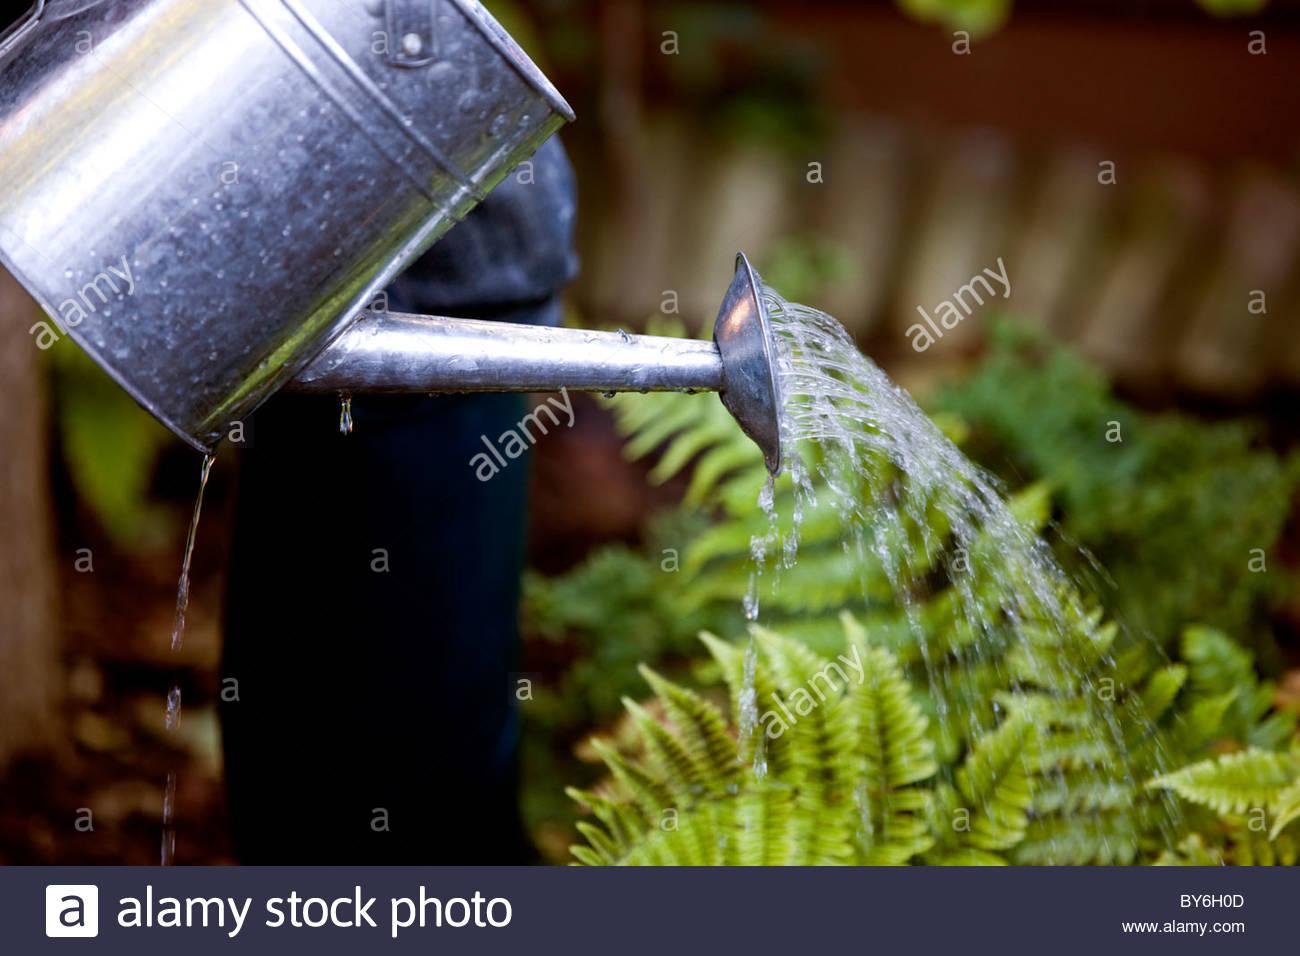 A man watering his garden - Stock Image